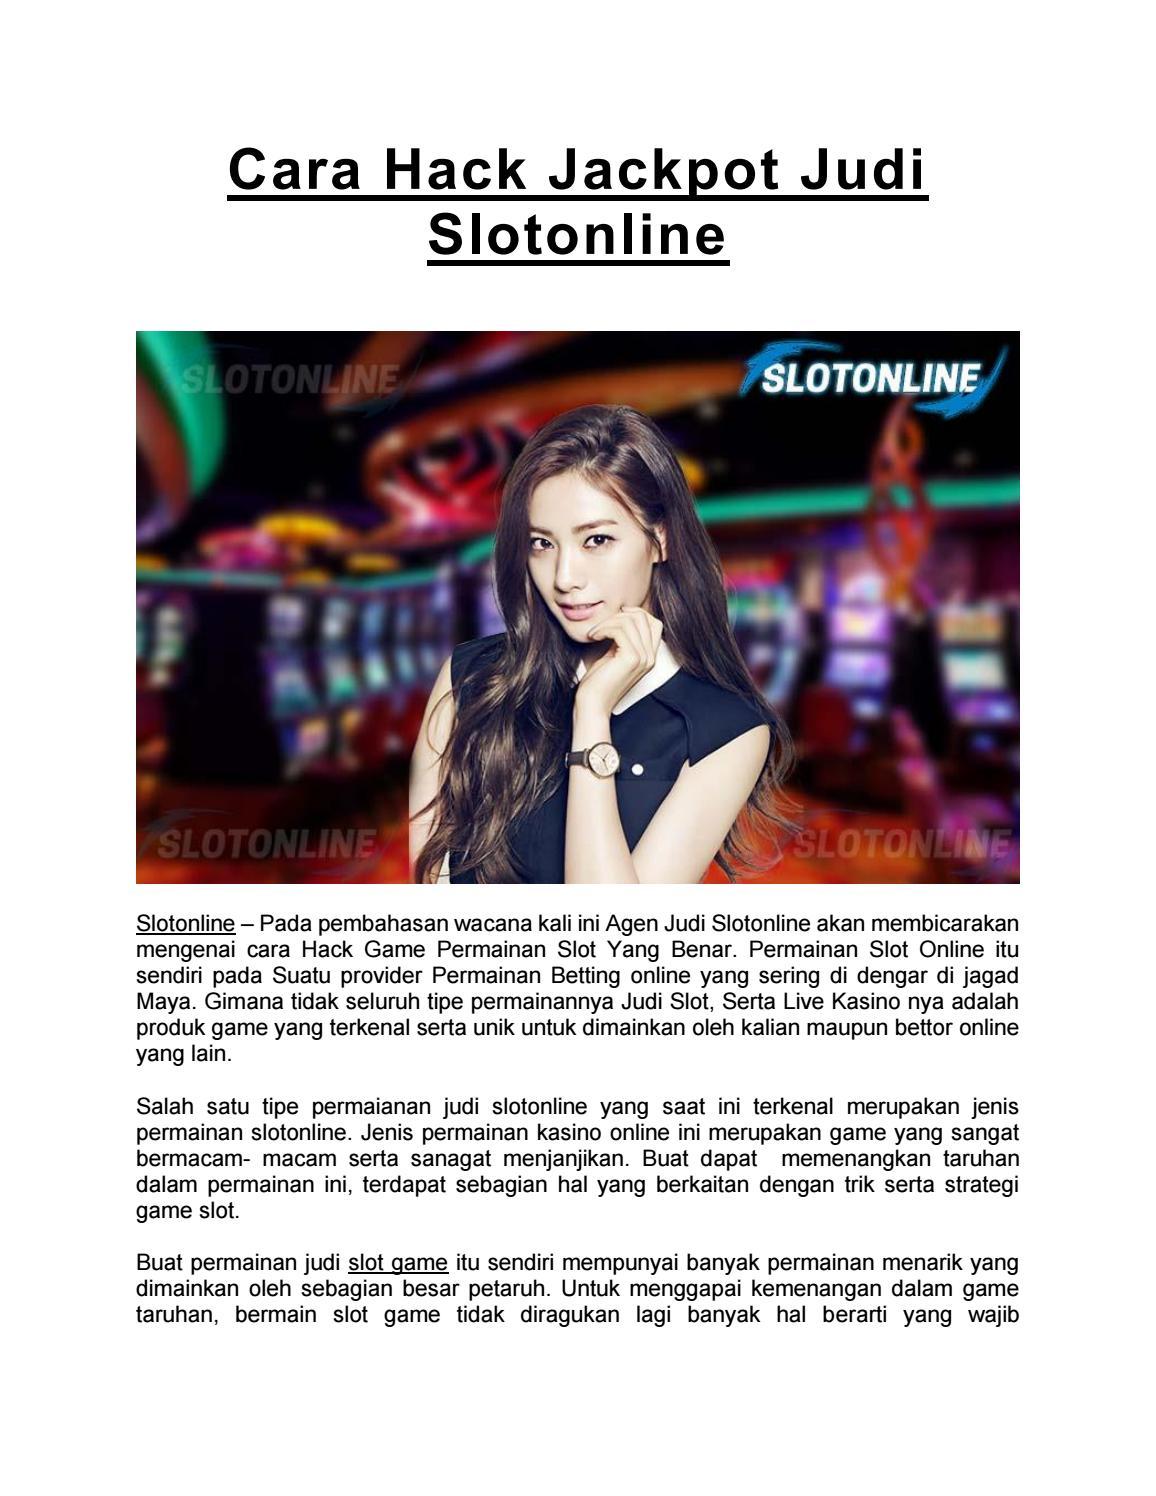 Cara Hack Jackpot Judi Slotonline By Slot Online Issuu